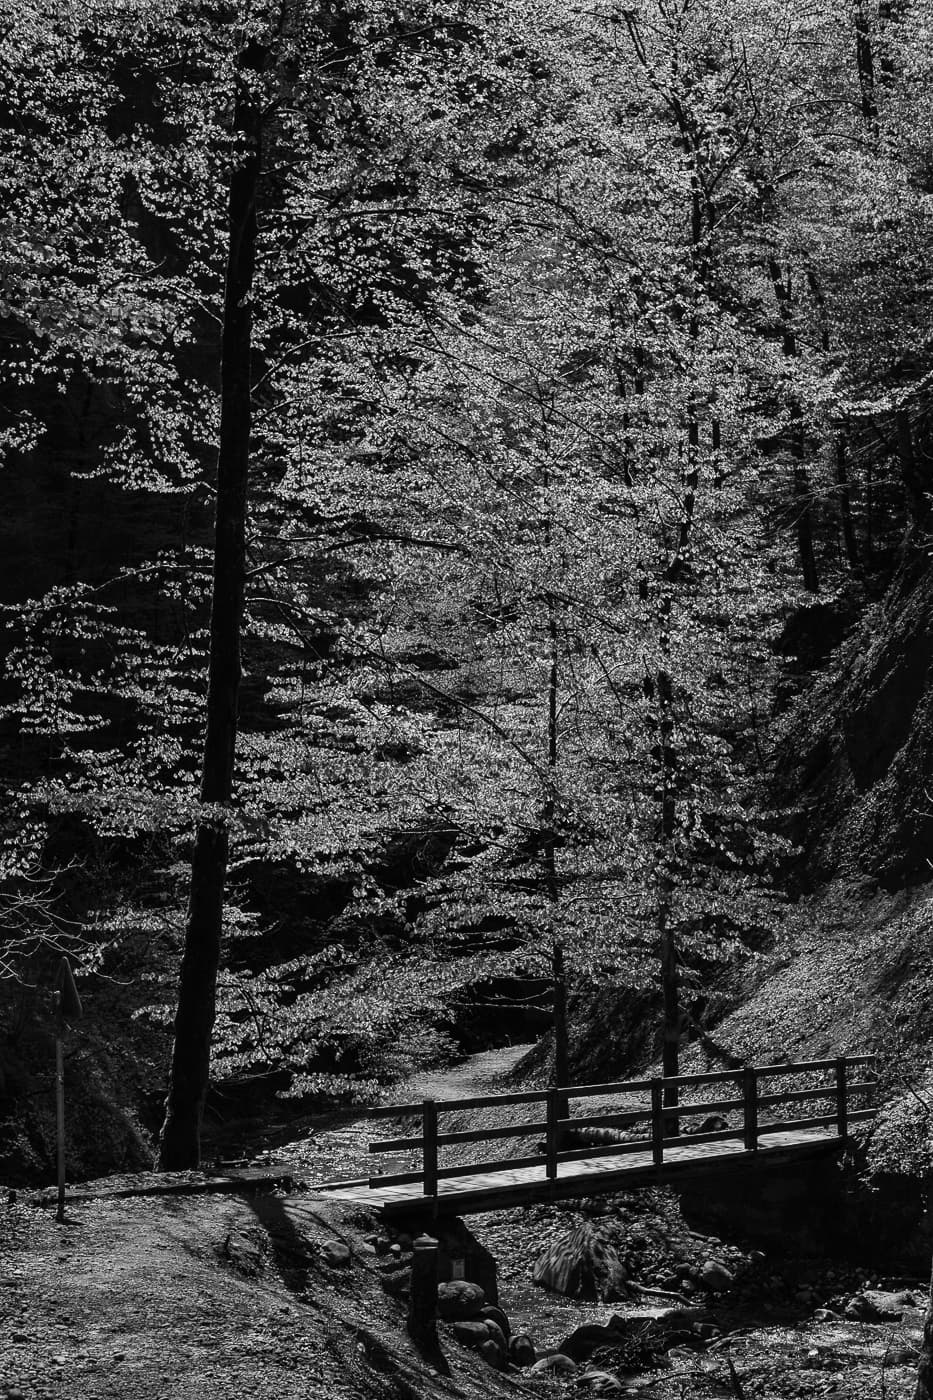 Brücke im Wald (schwarzweiss)